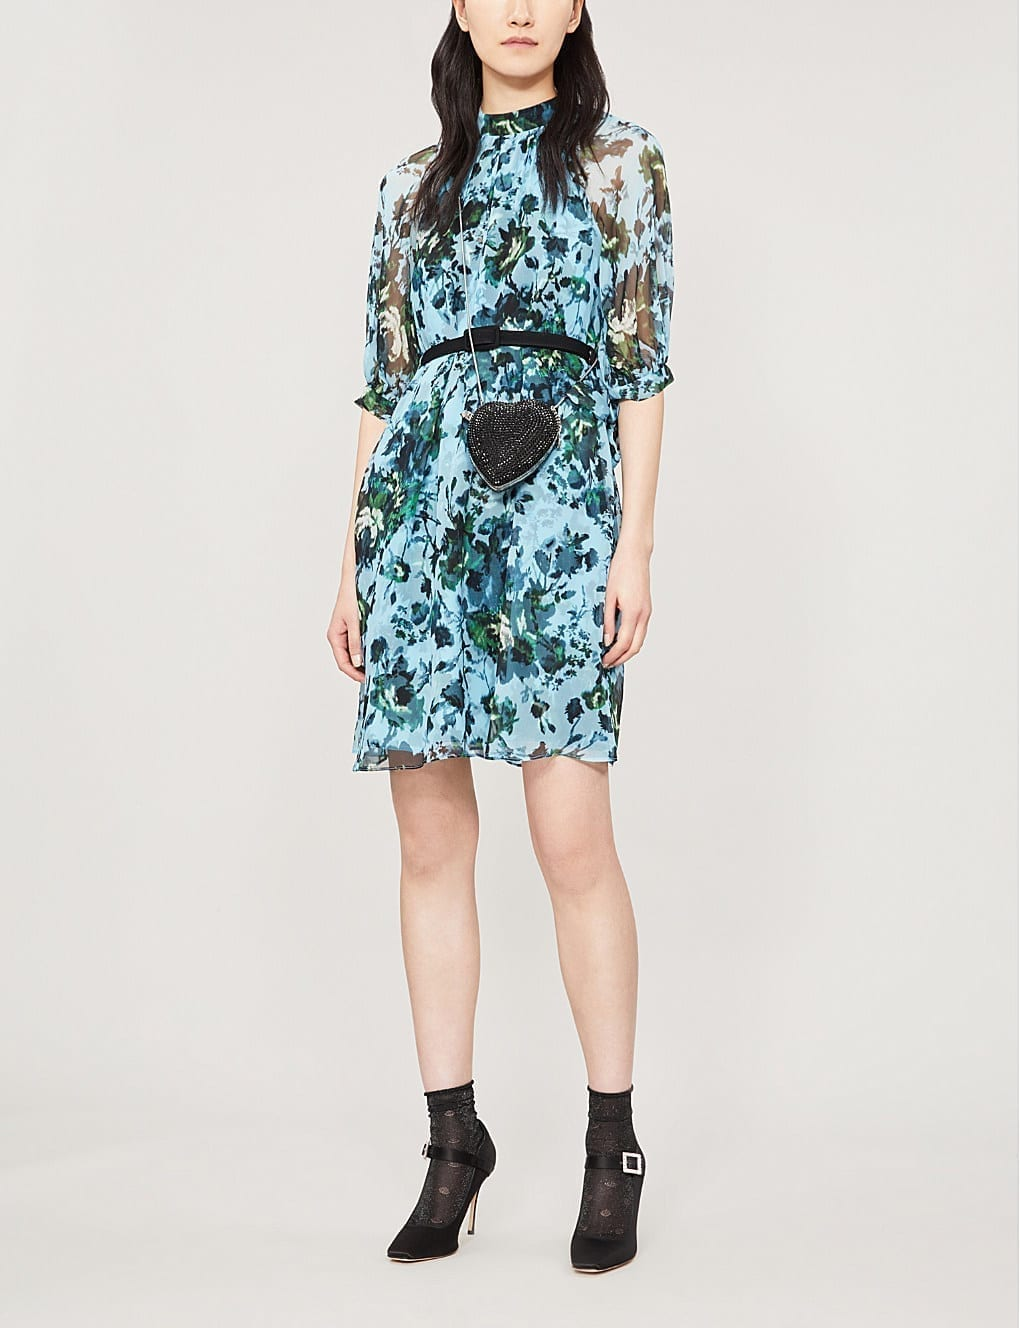 ERDEM Melodie High-Neck Floral-Print Silk-Chiffon Blue Green Dress